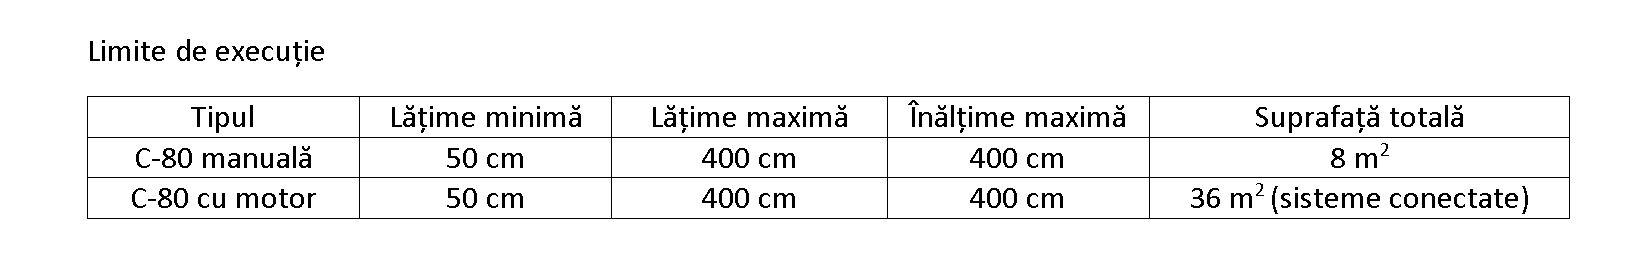 Limite executie tabel C80